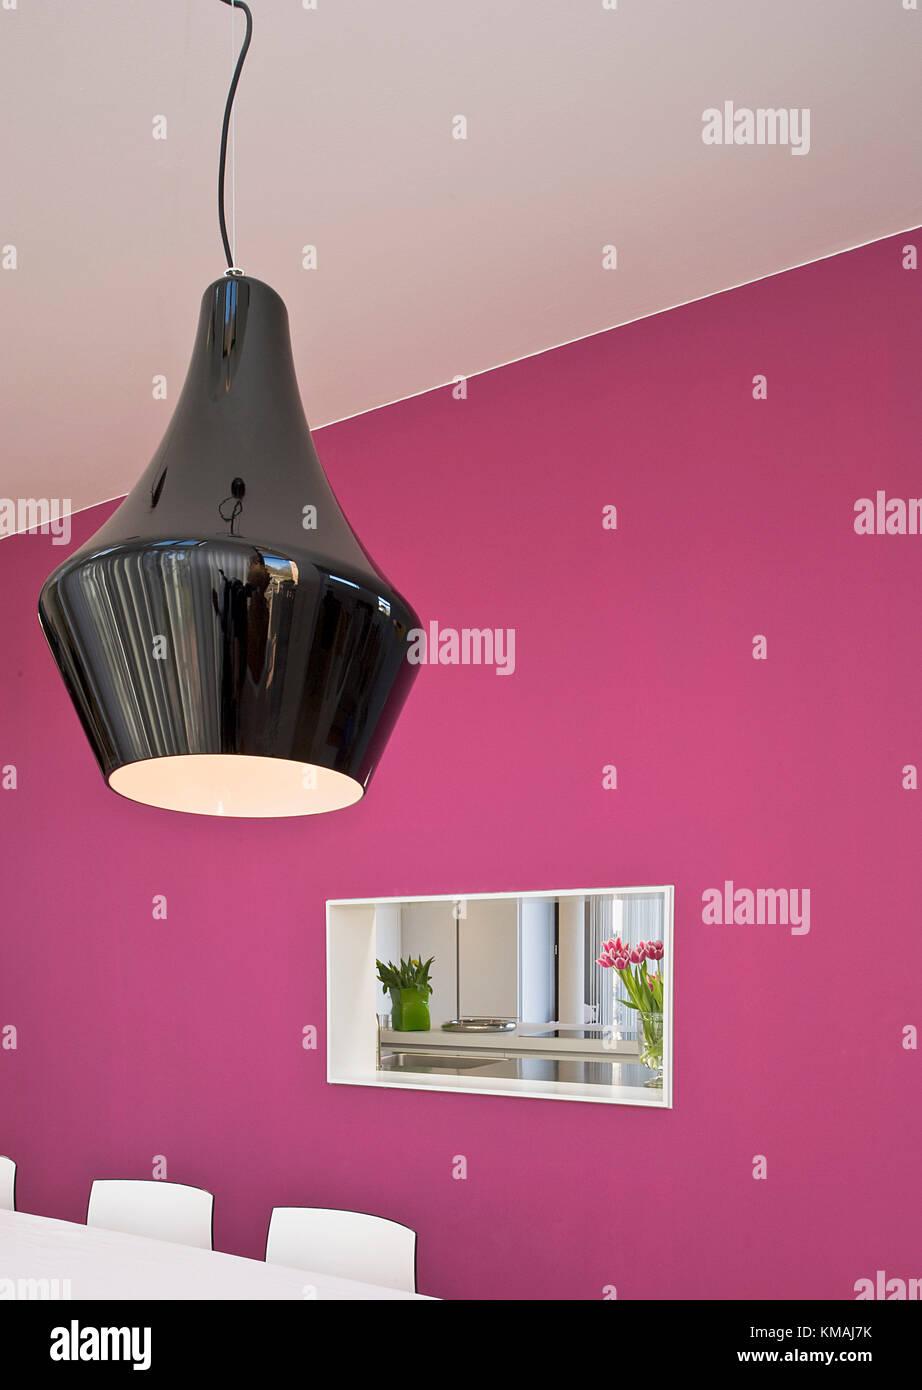 Einfamilienhaus in Hannover, modern, Design, lila, speziell, Durchblick - Stock Image